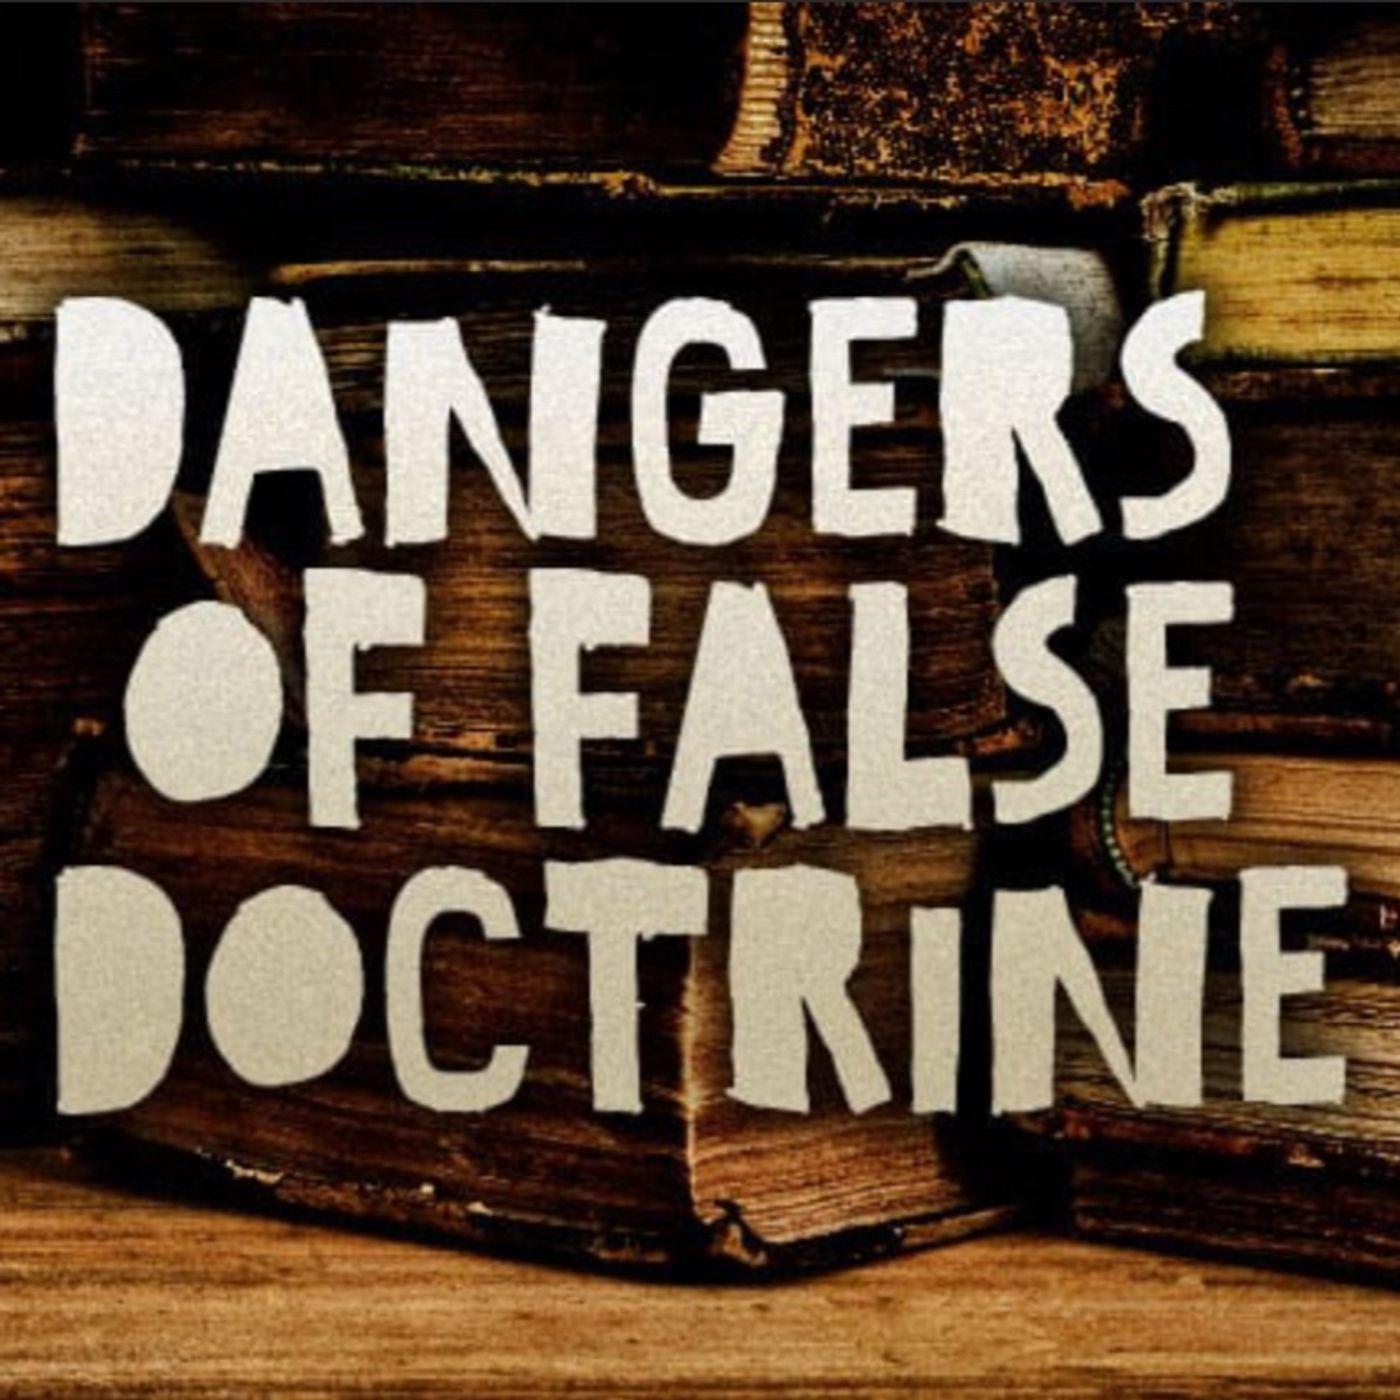 Live From Apostolic Pentecostal Network - False Prophets in a Modern World